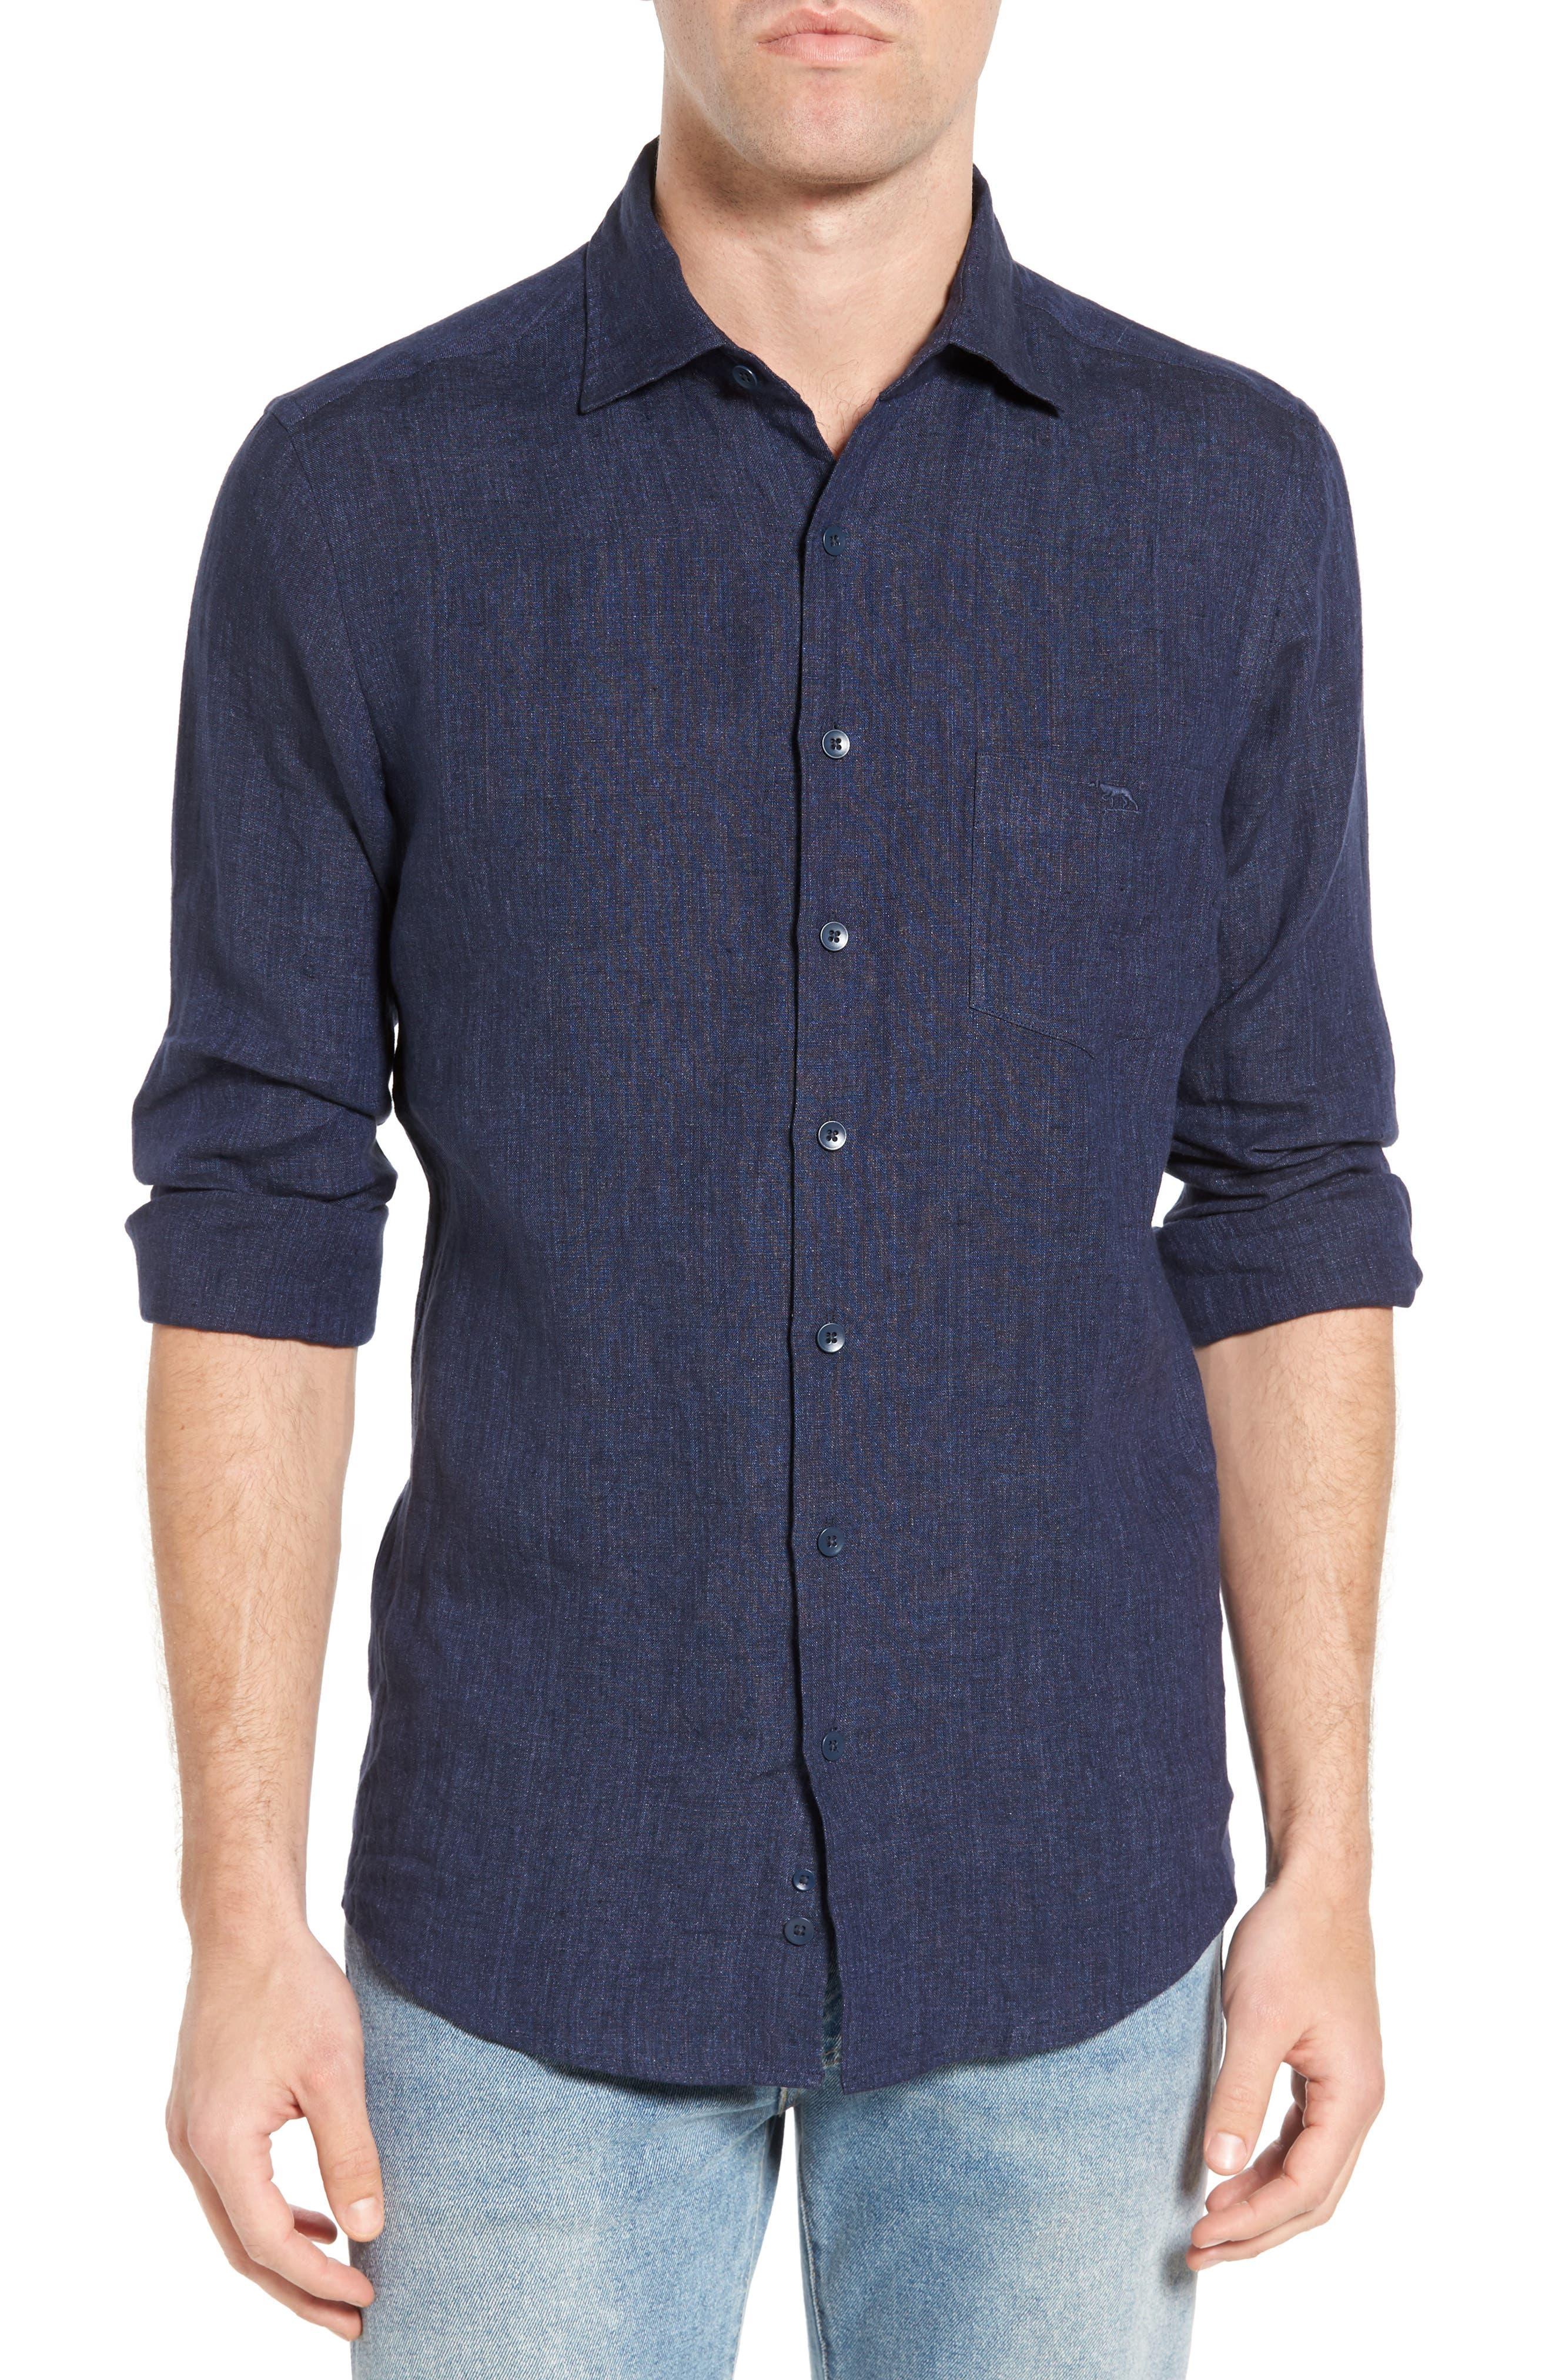 Alternate Image 1 Selected - Rodd & Gunn Mount Bruce Sports Fit Linen Sport Shirt